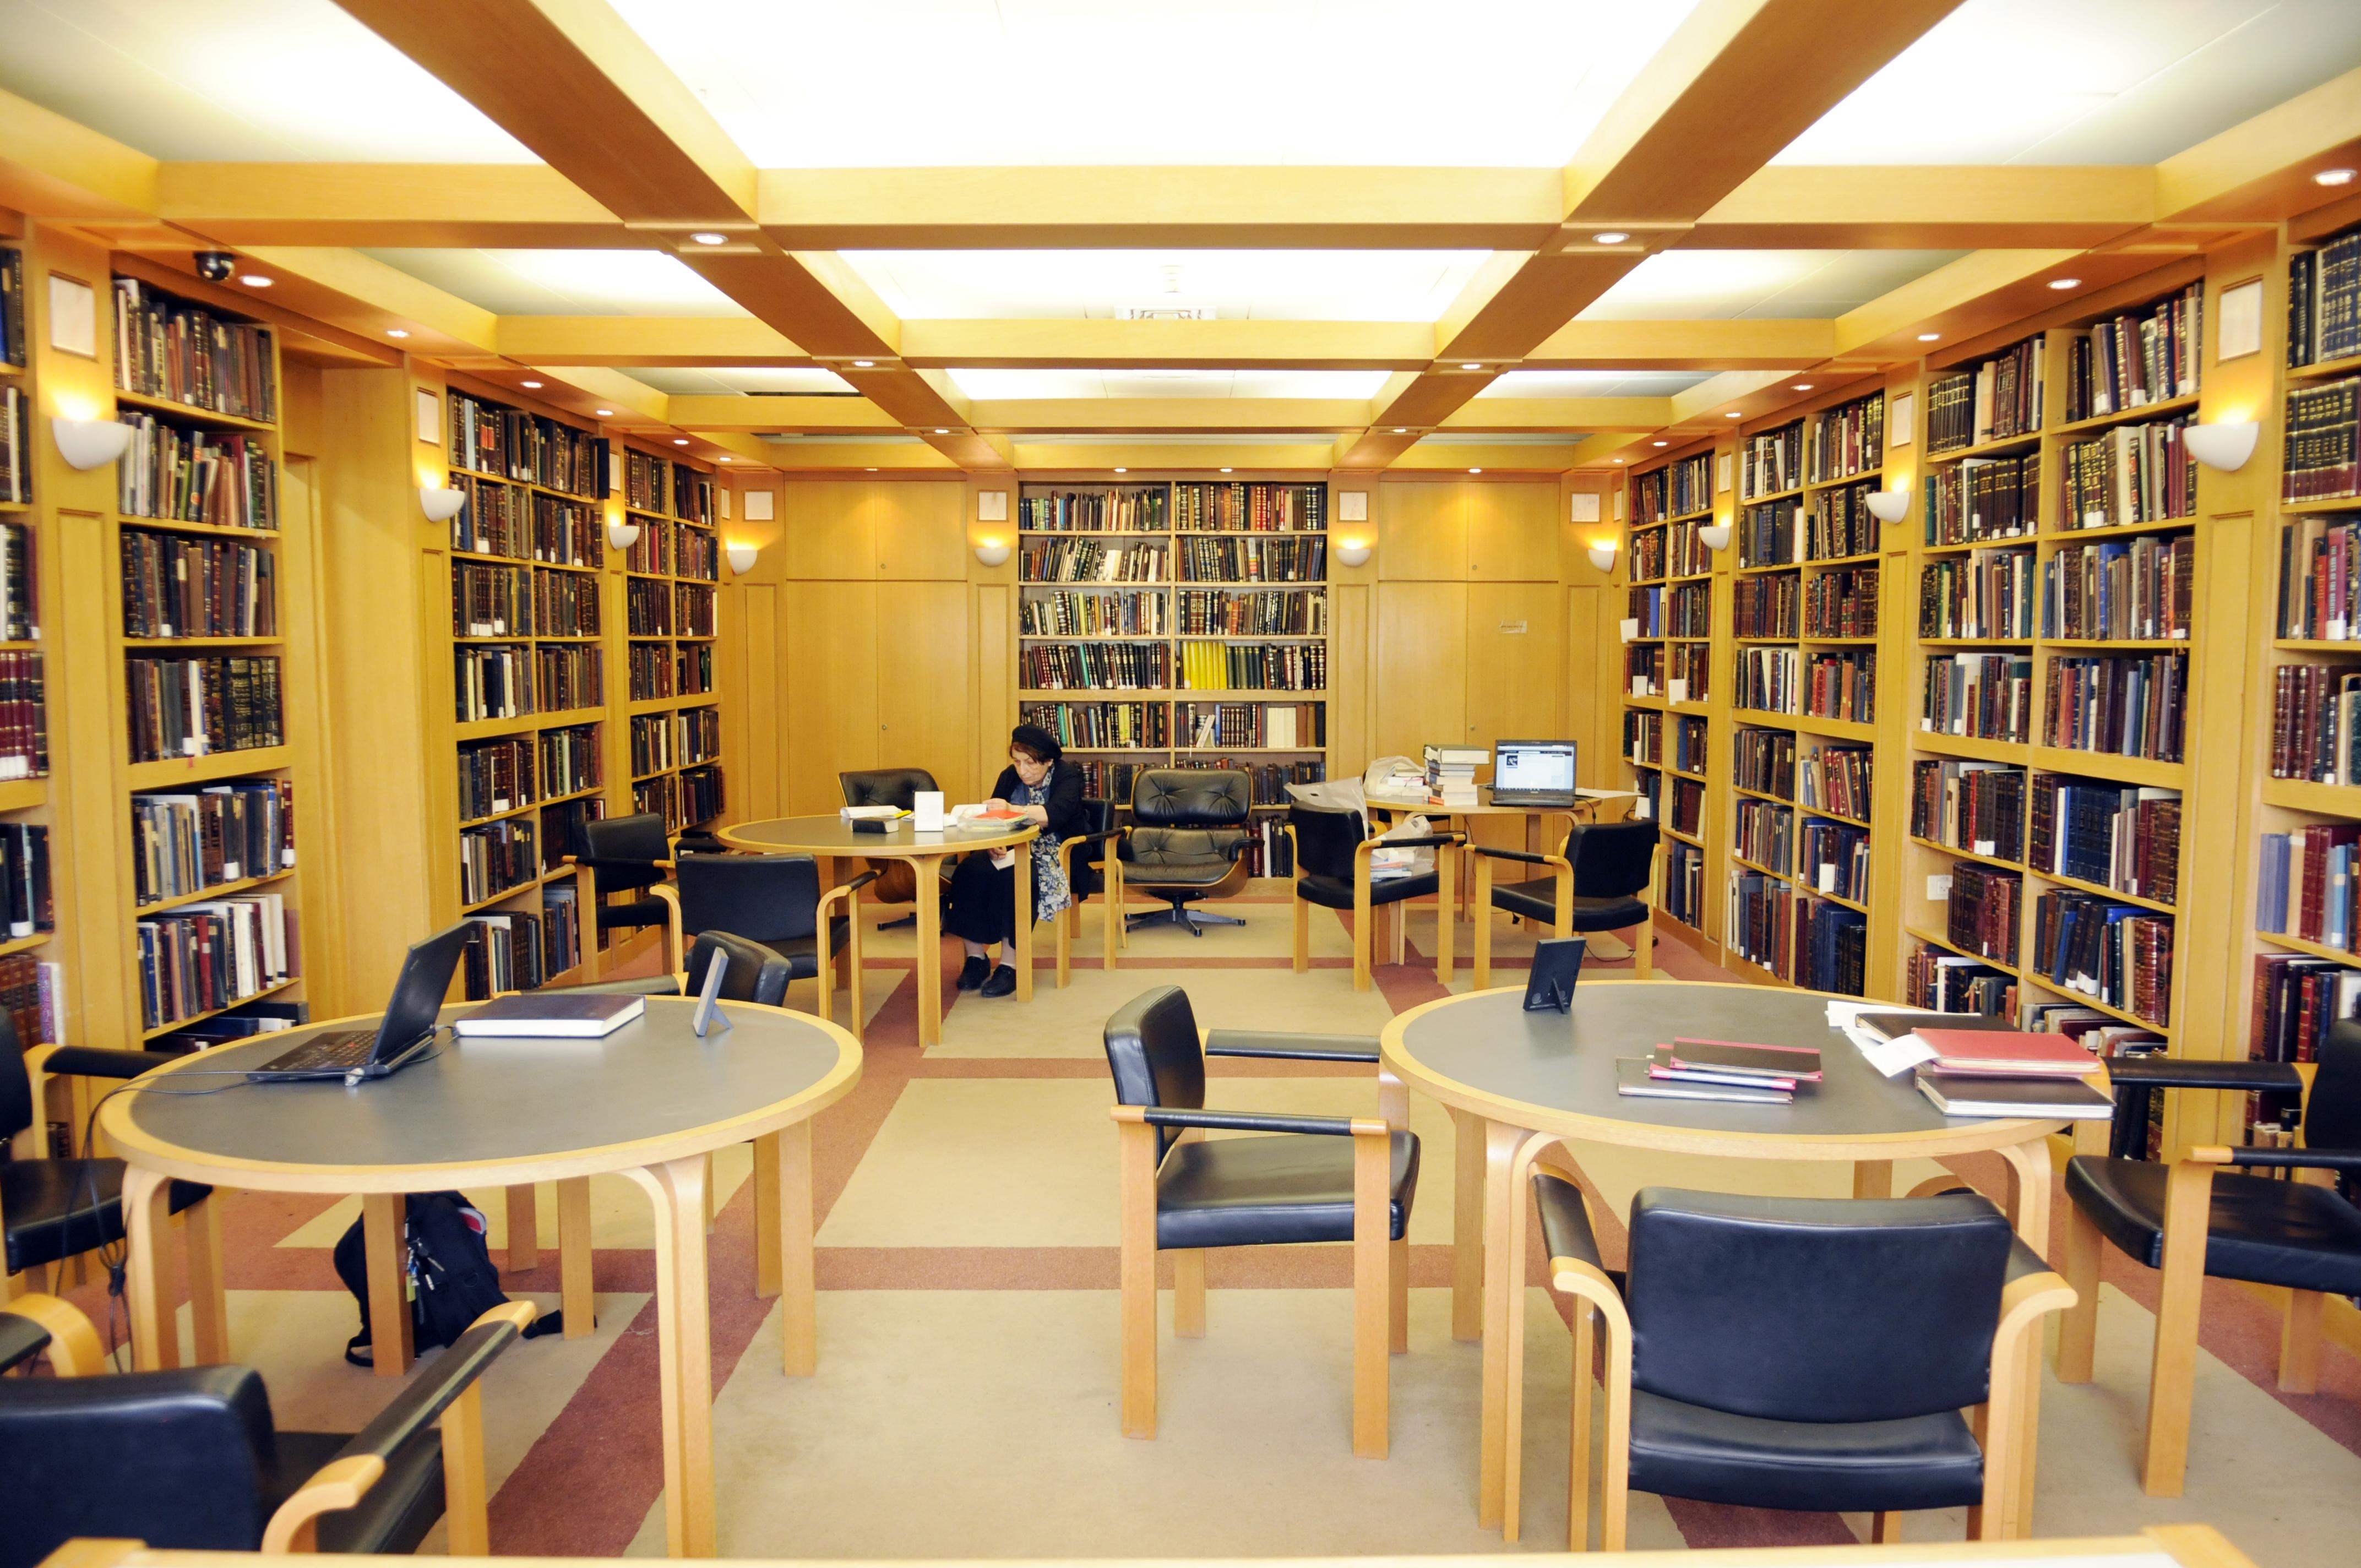 Professor Gershom Scholem The Gershom Scholem Library